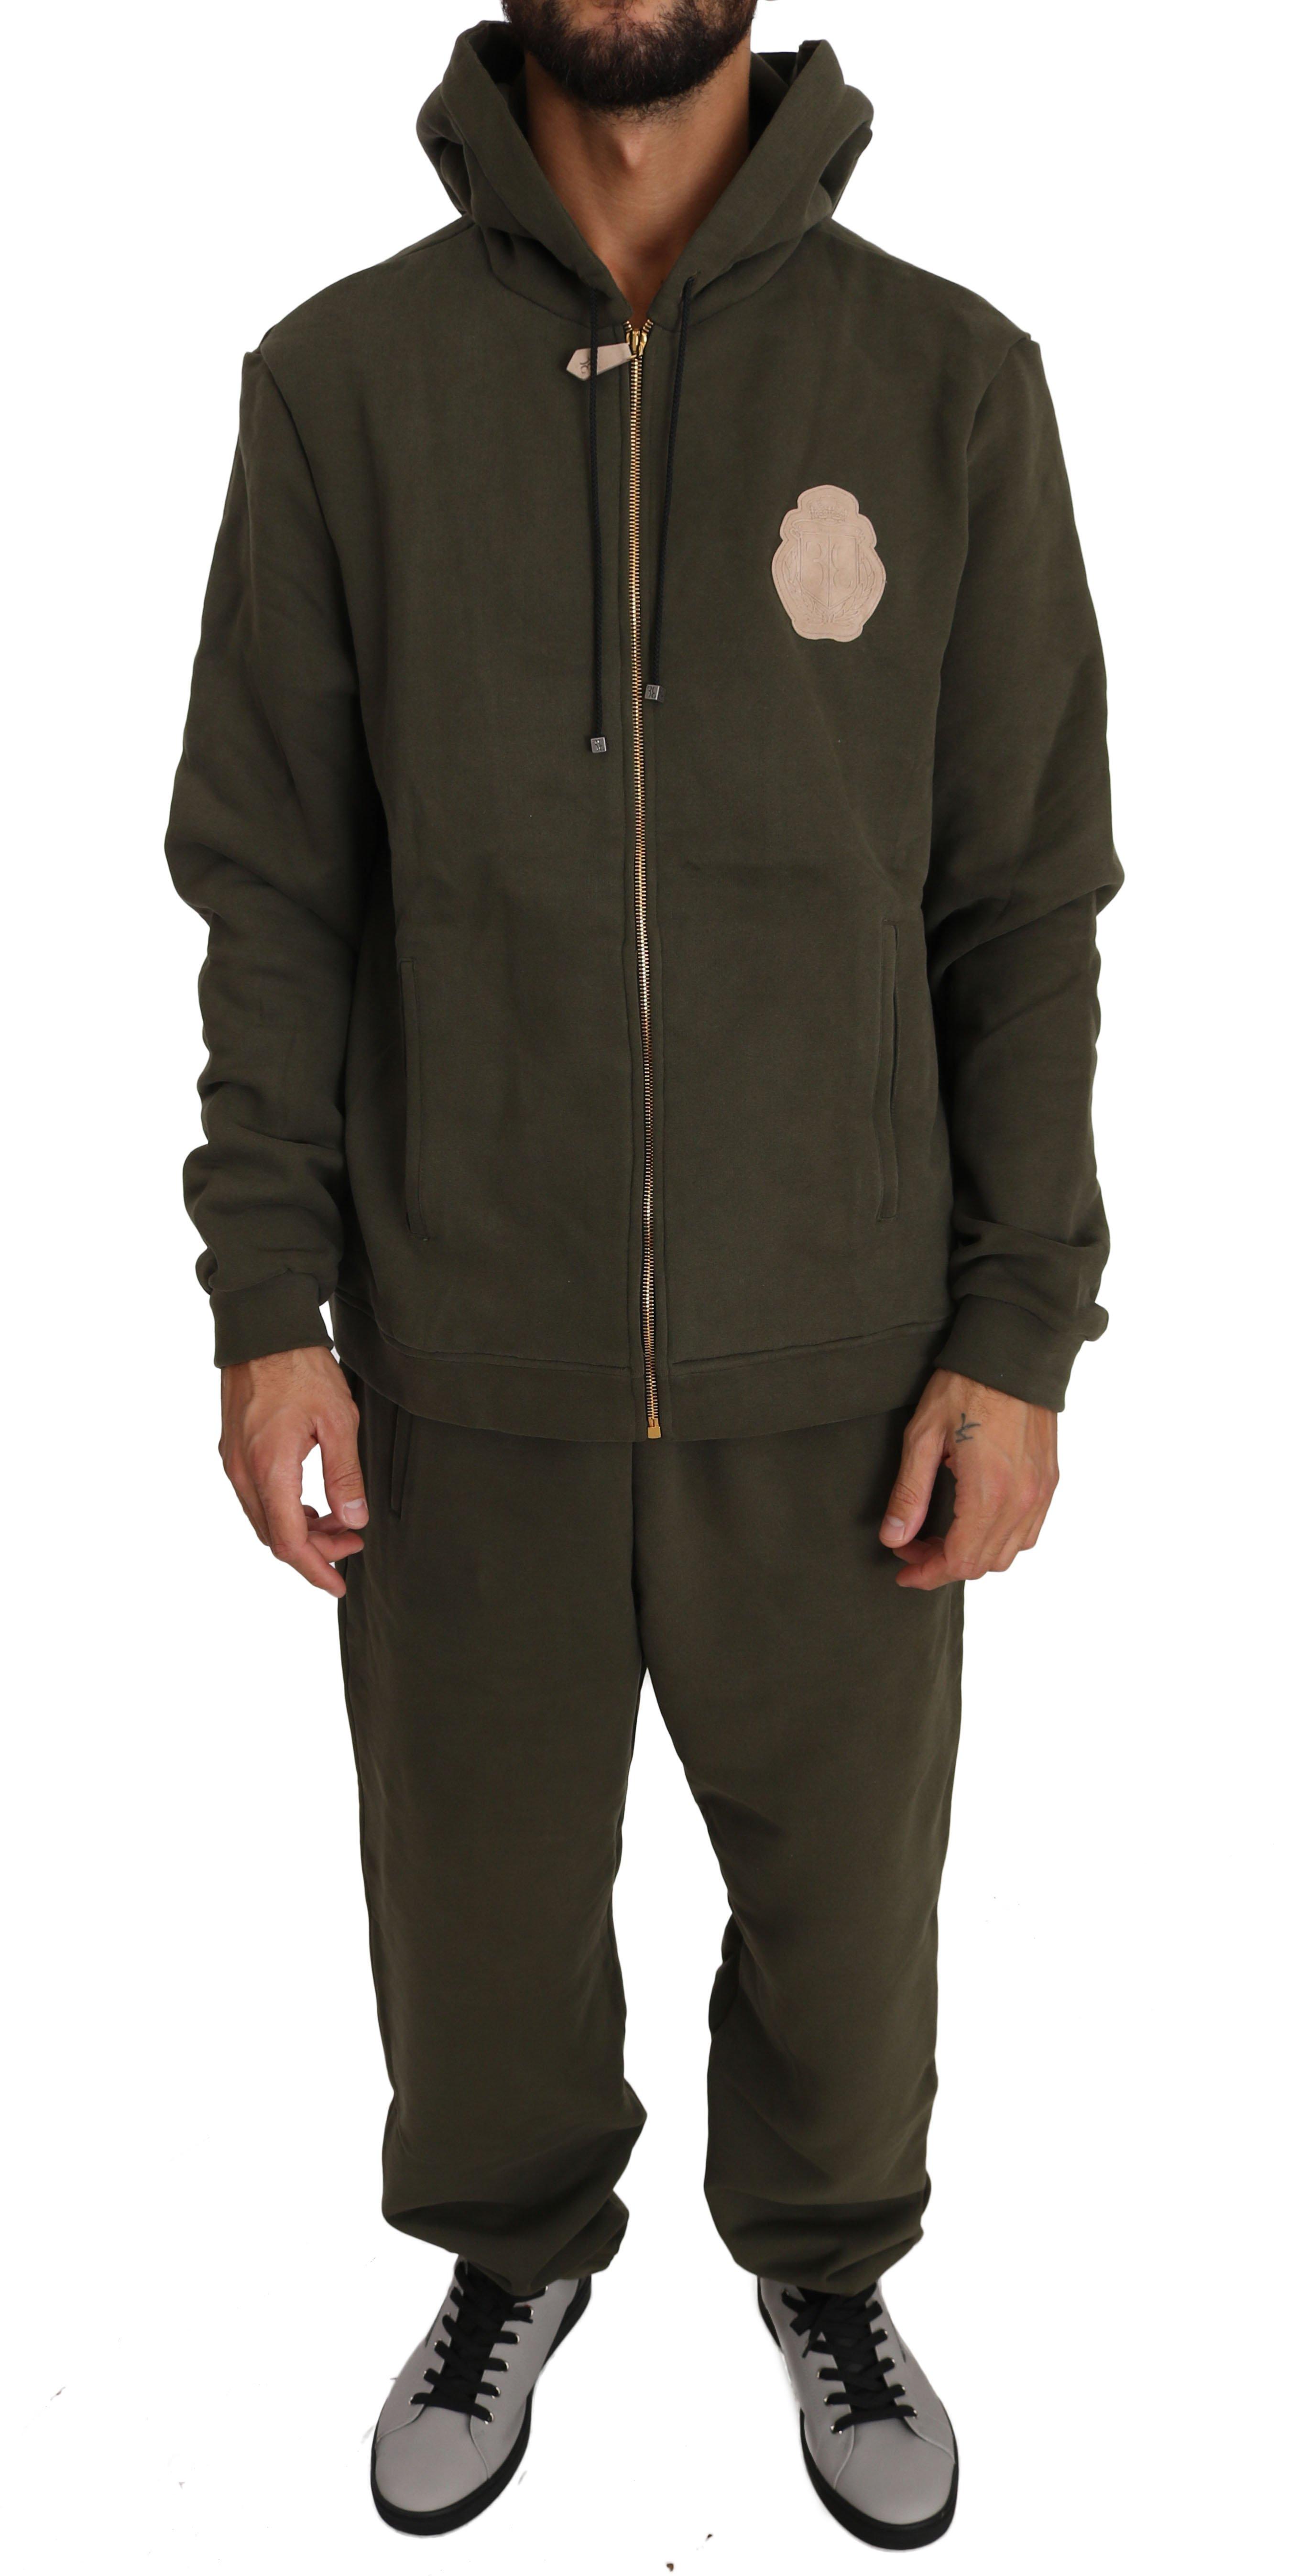 Billionaire Italian Couture Men's Hooded Full Zip Sweater Green BIL1051 - XXL